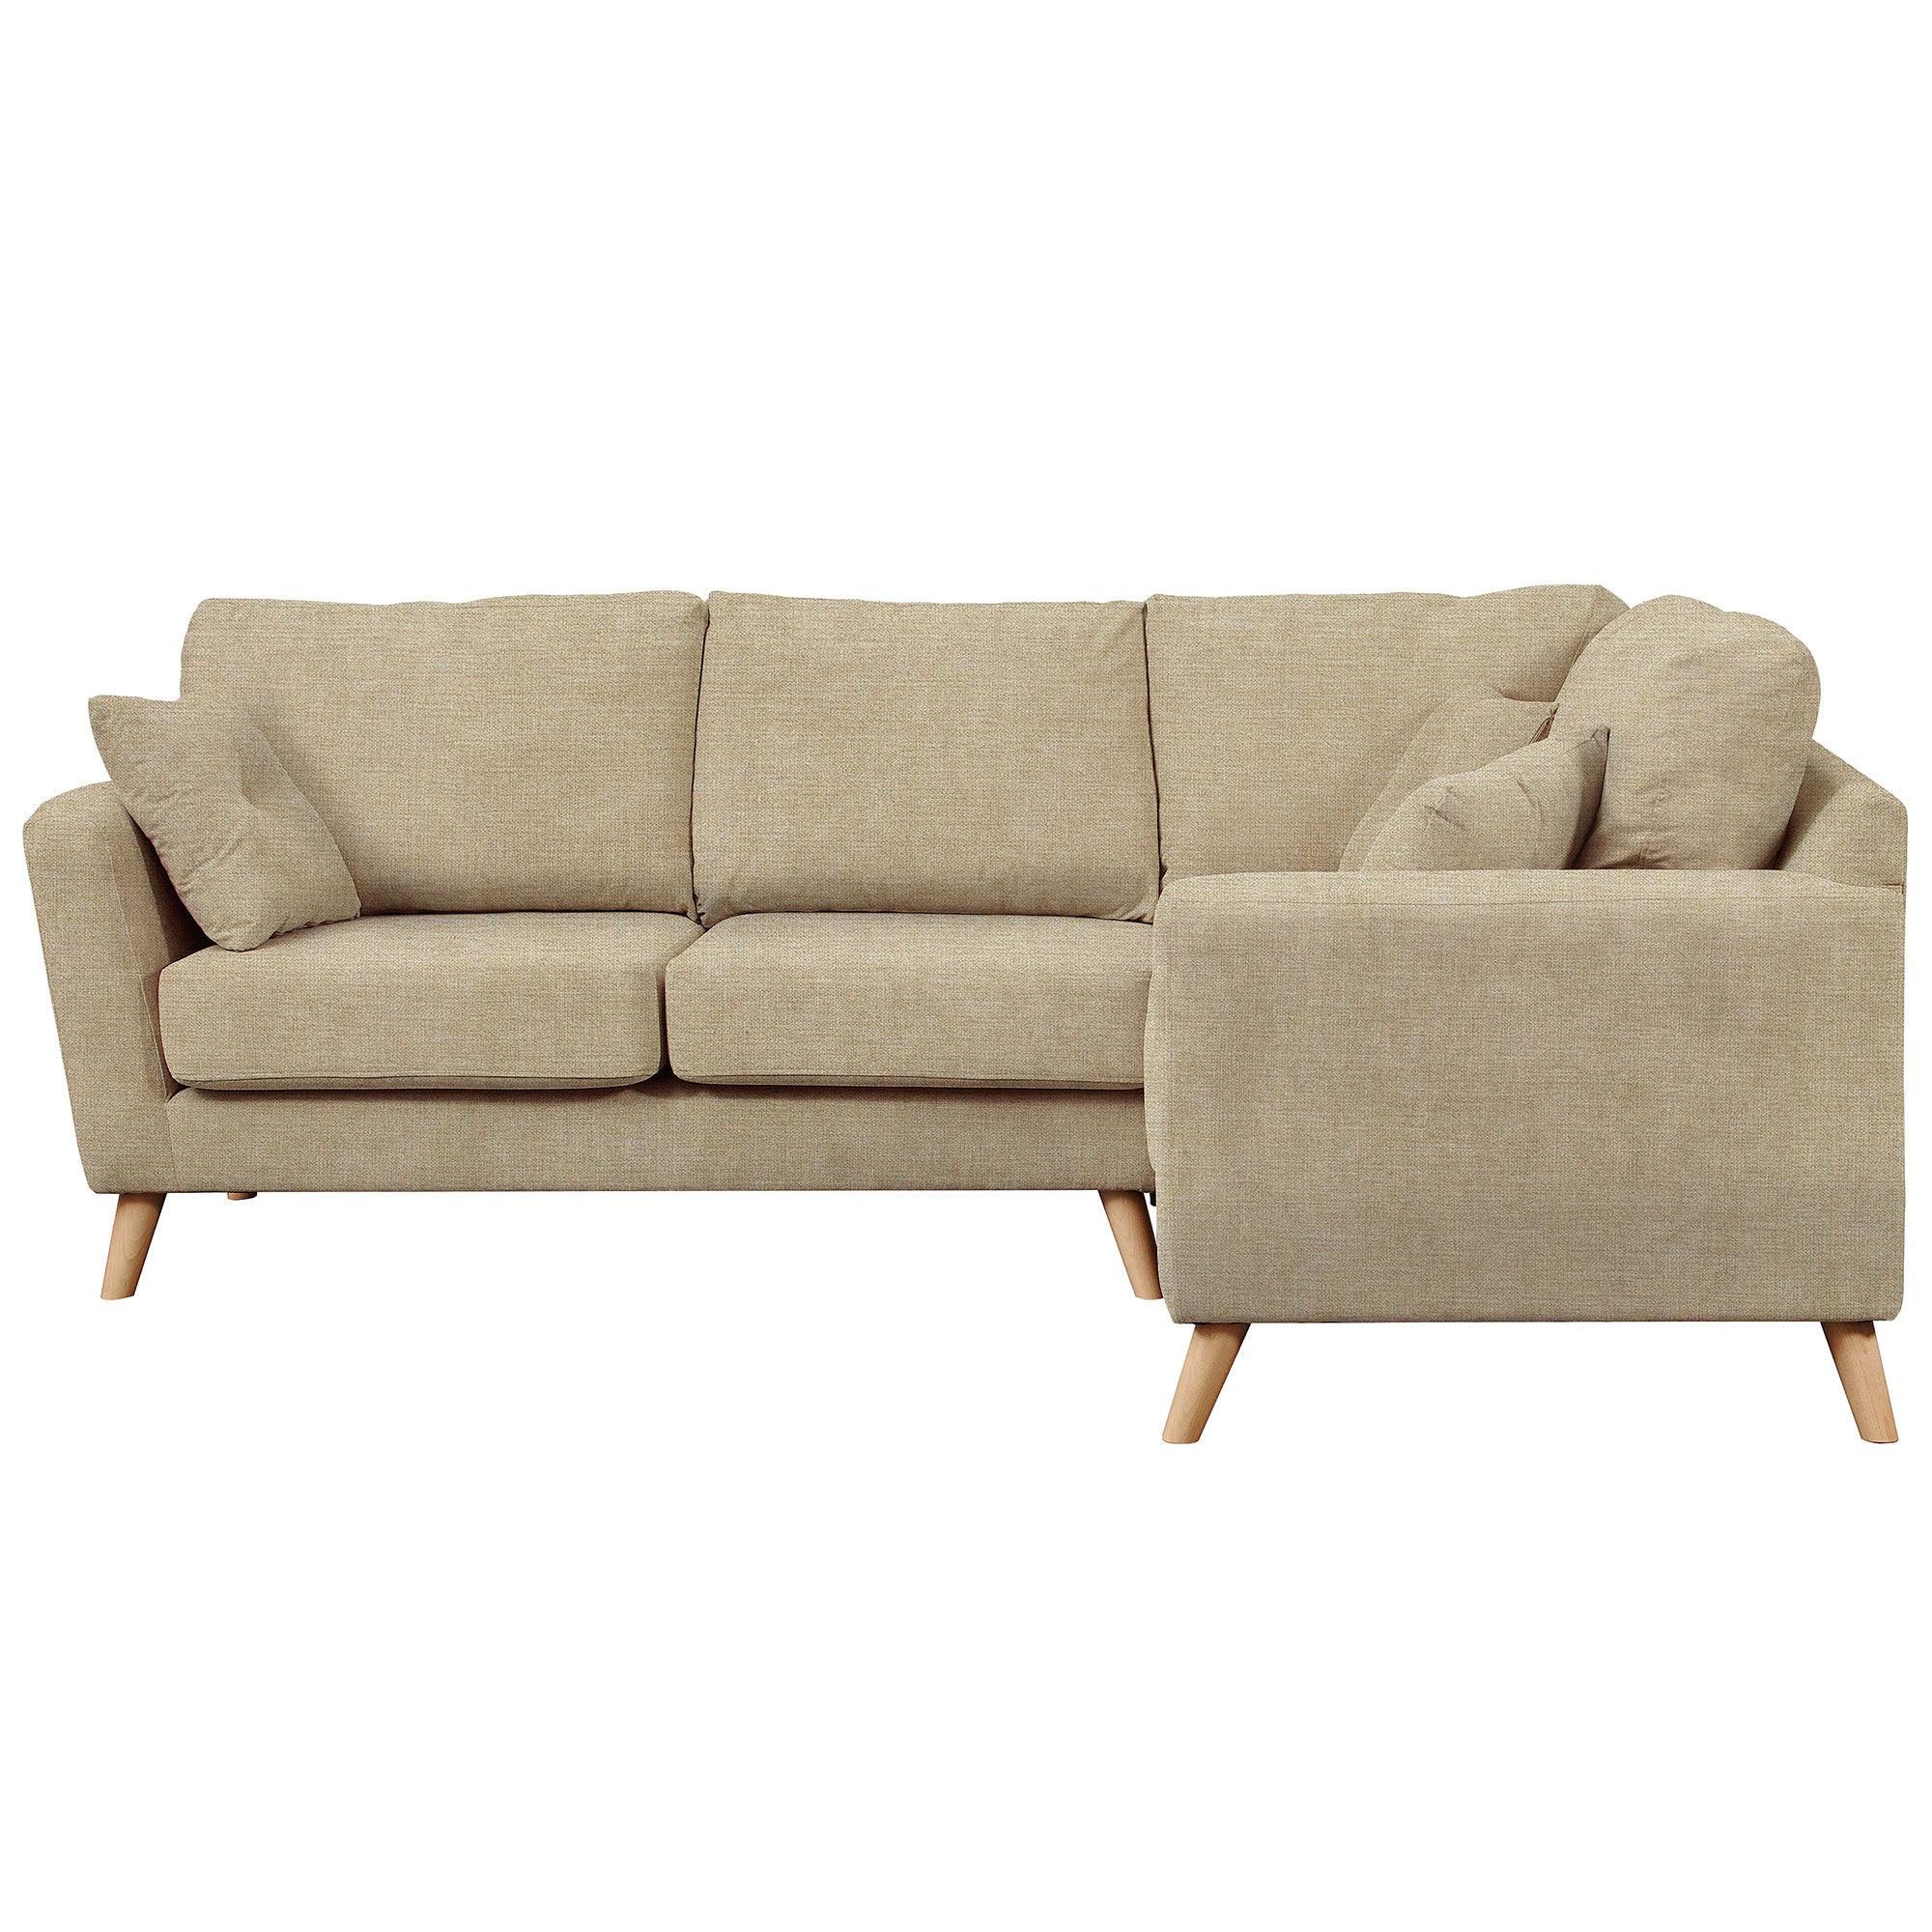 Morley Corner Sofa